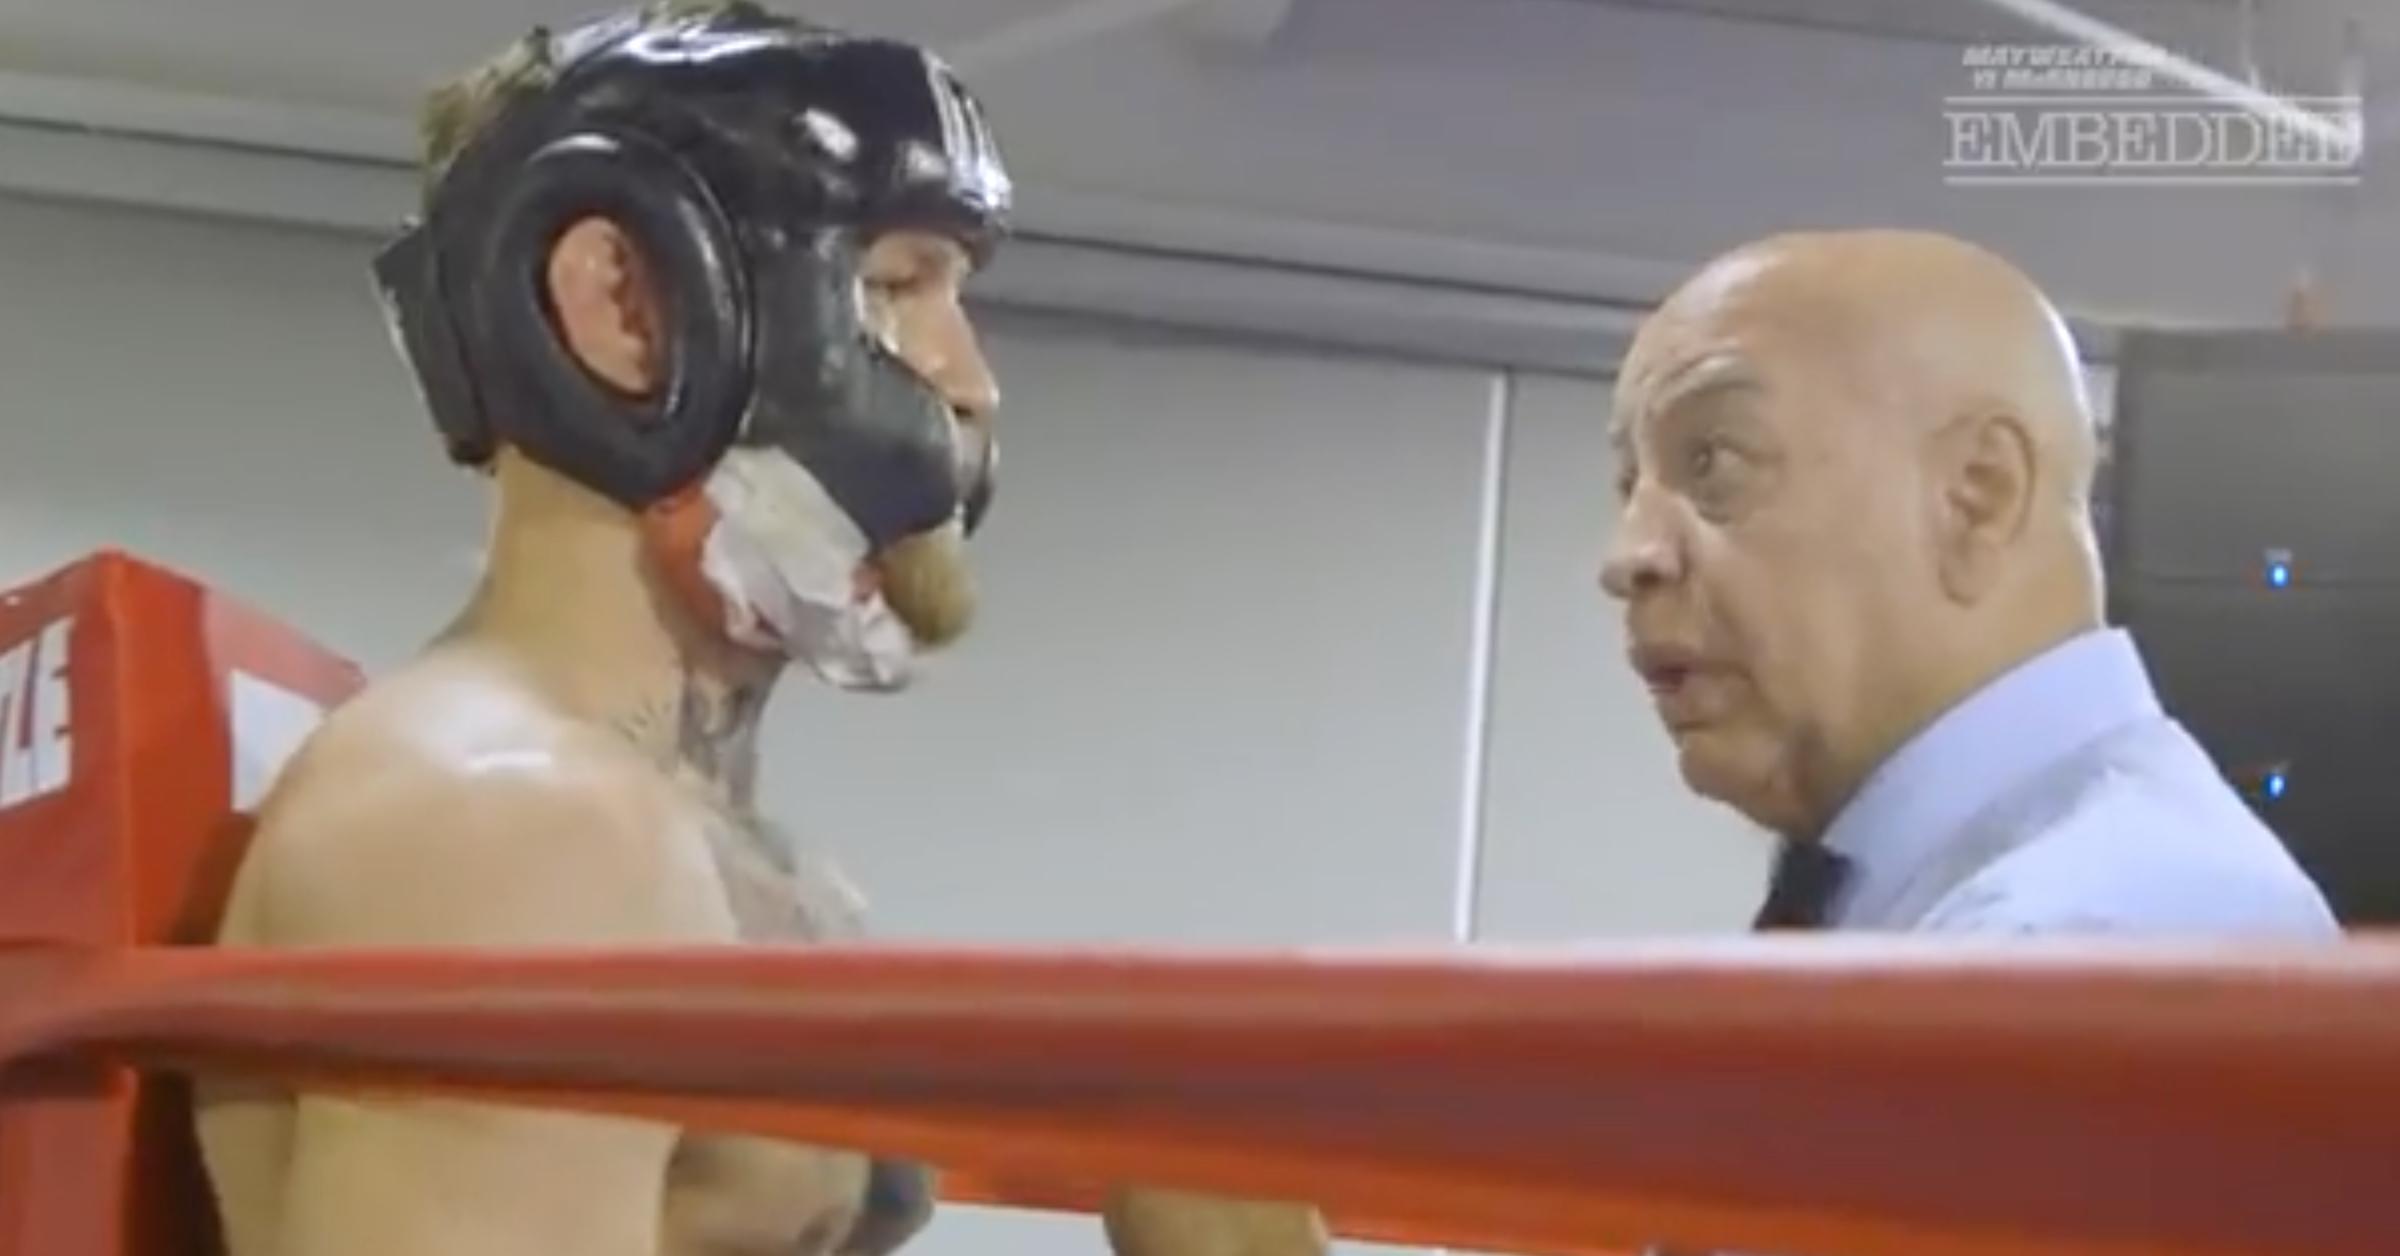 WATCH: Mayweather vs McGregor Embedded: Episode 2